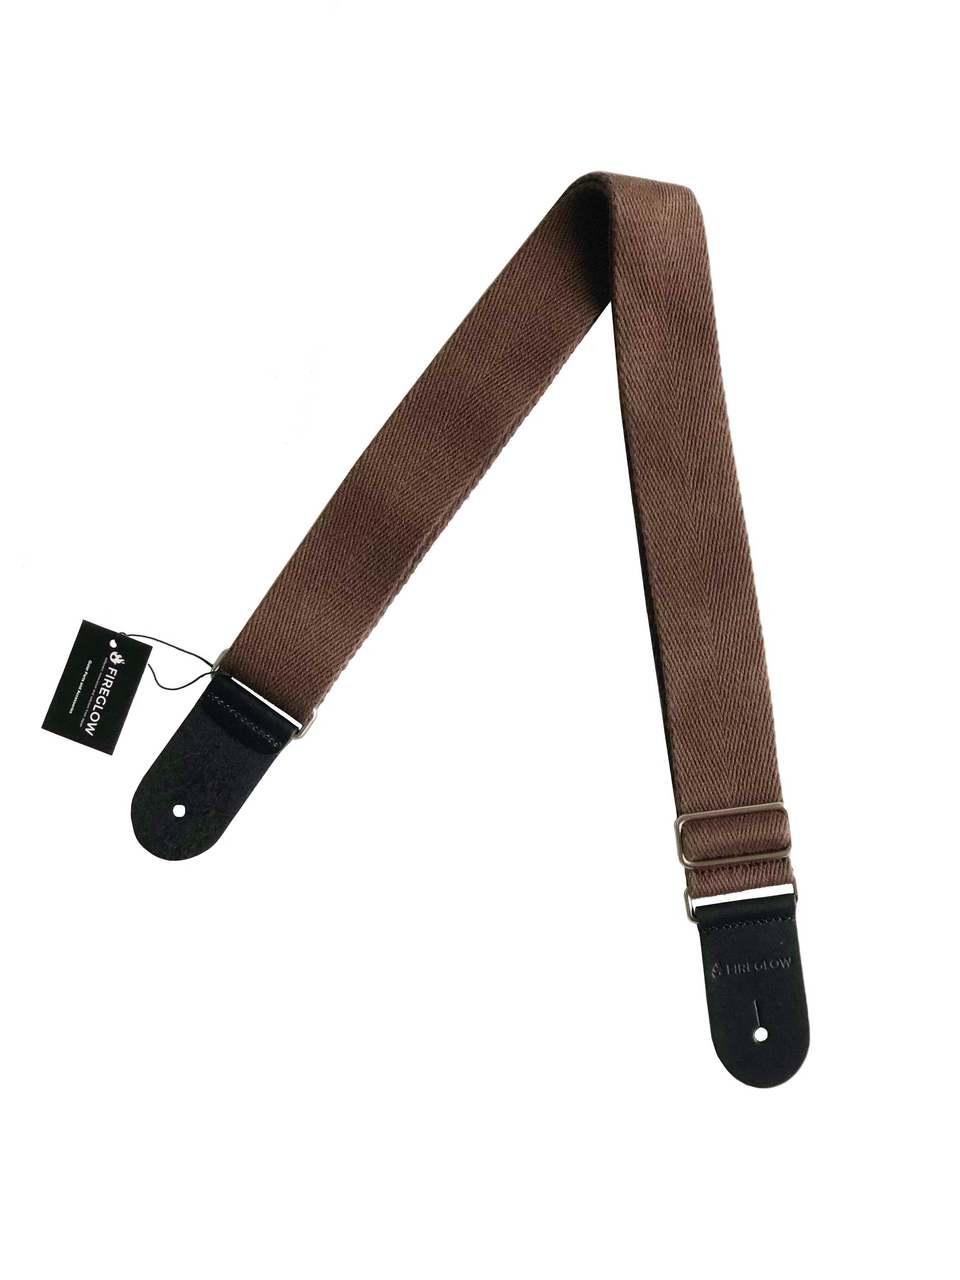 FIREGLOW Guitar parts & Accessories Strap series CTW002BR (Brown)